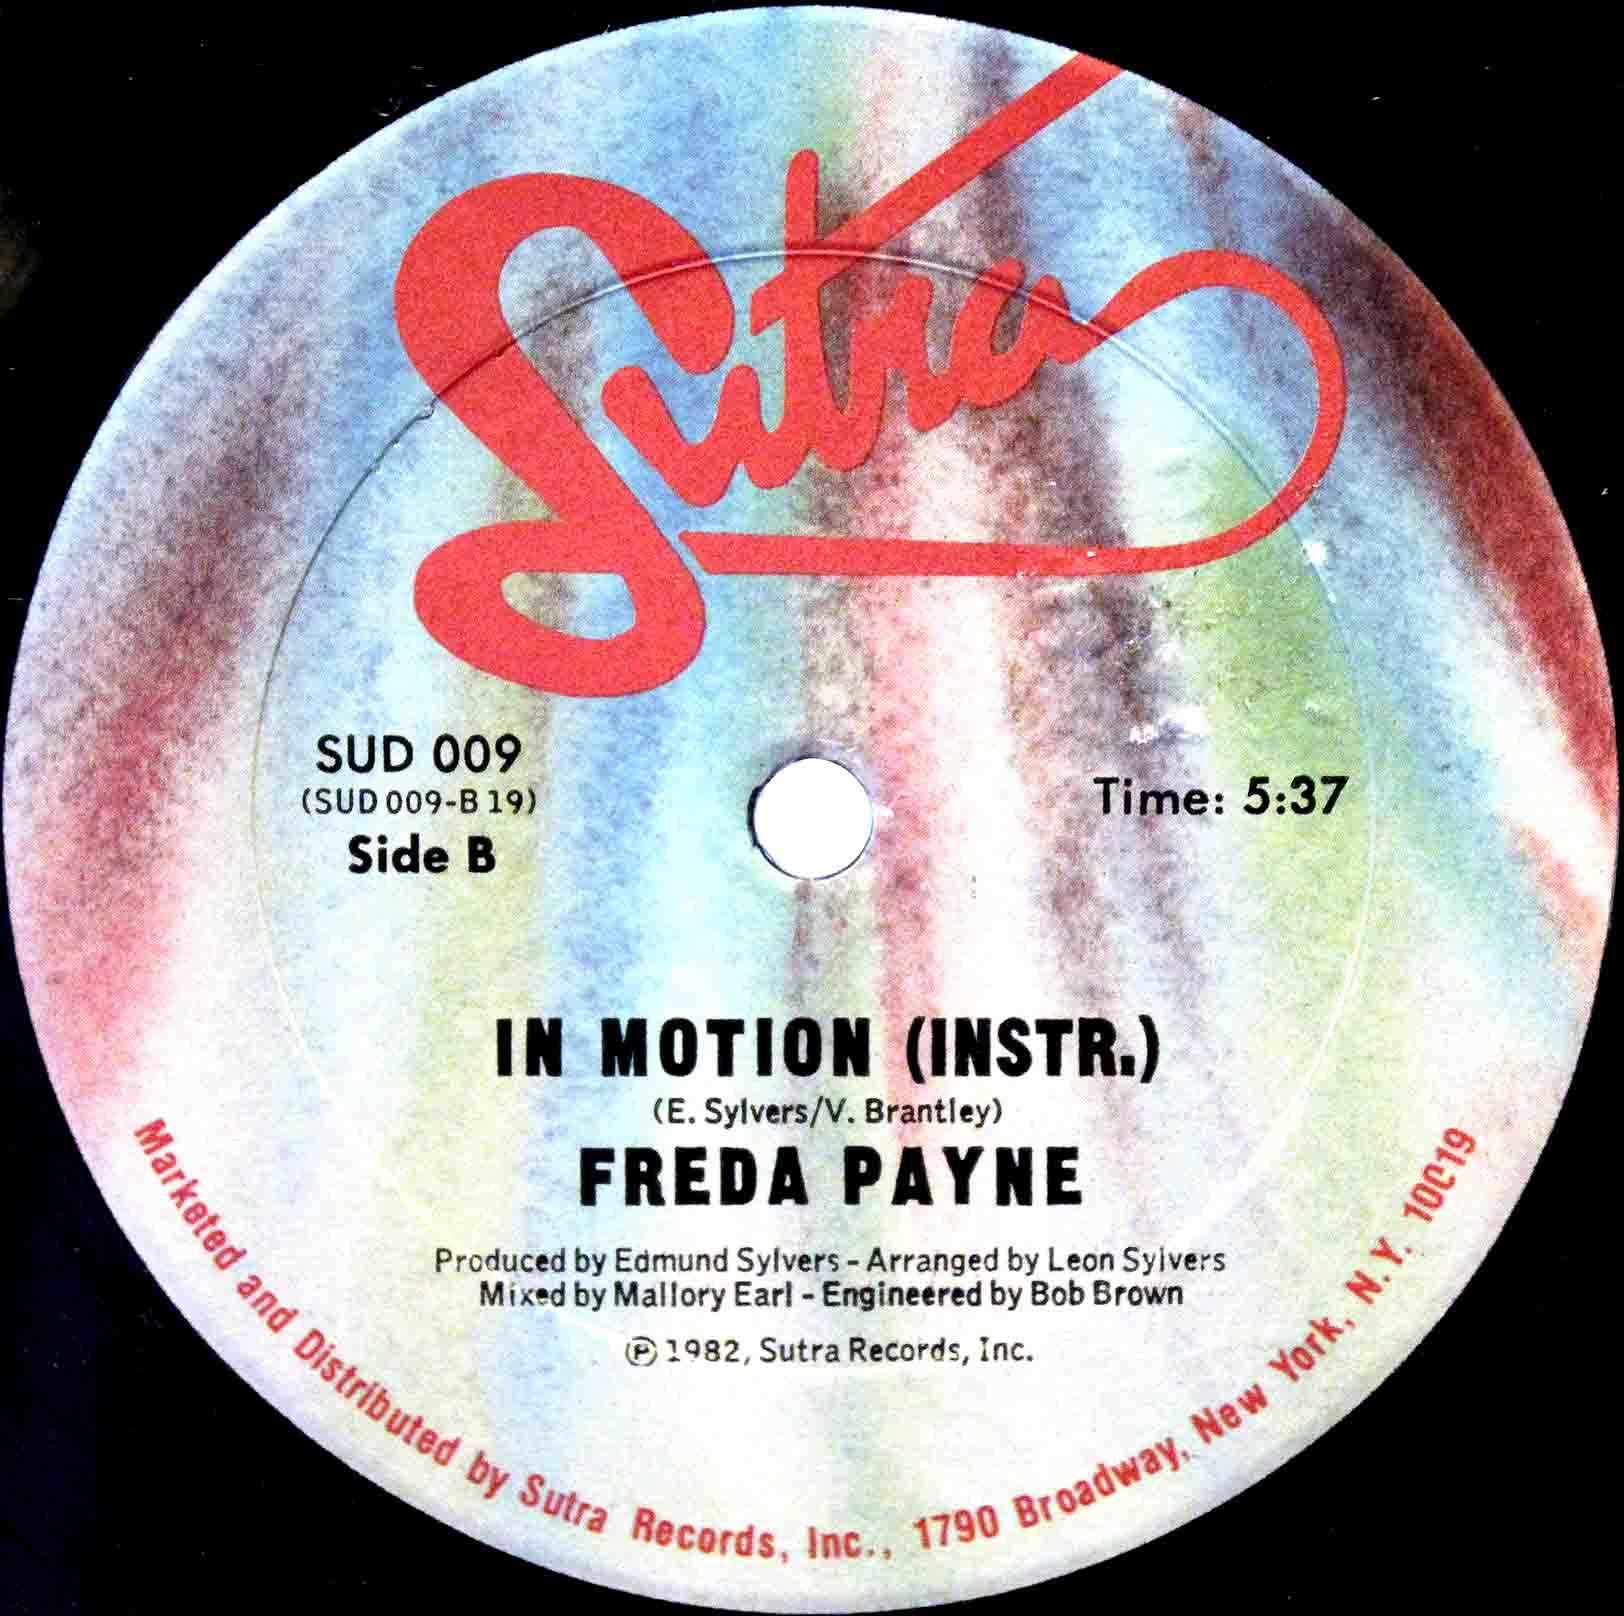 Freda Payne - In Motion 04